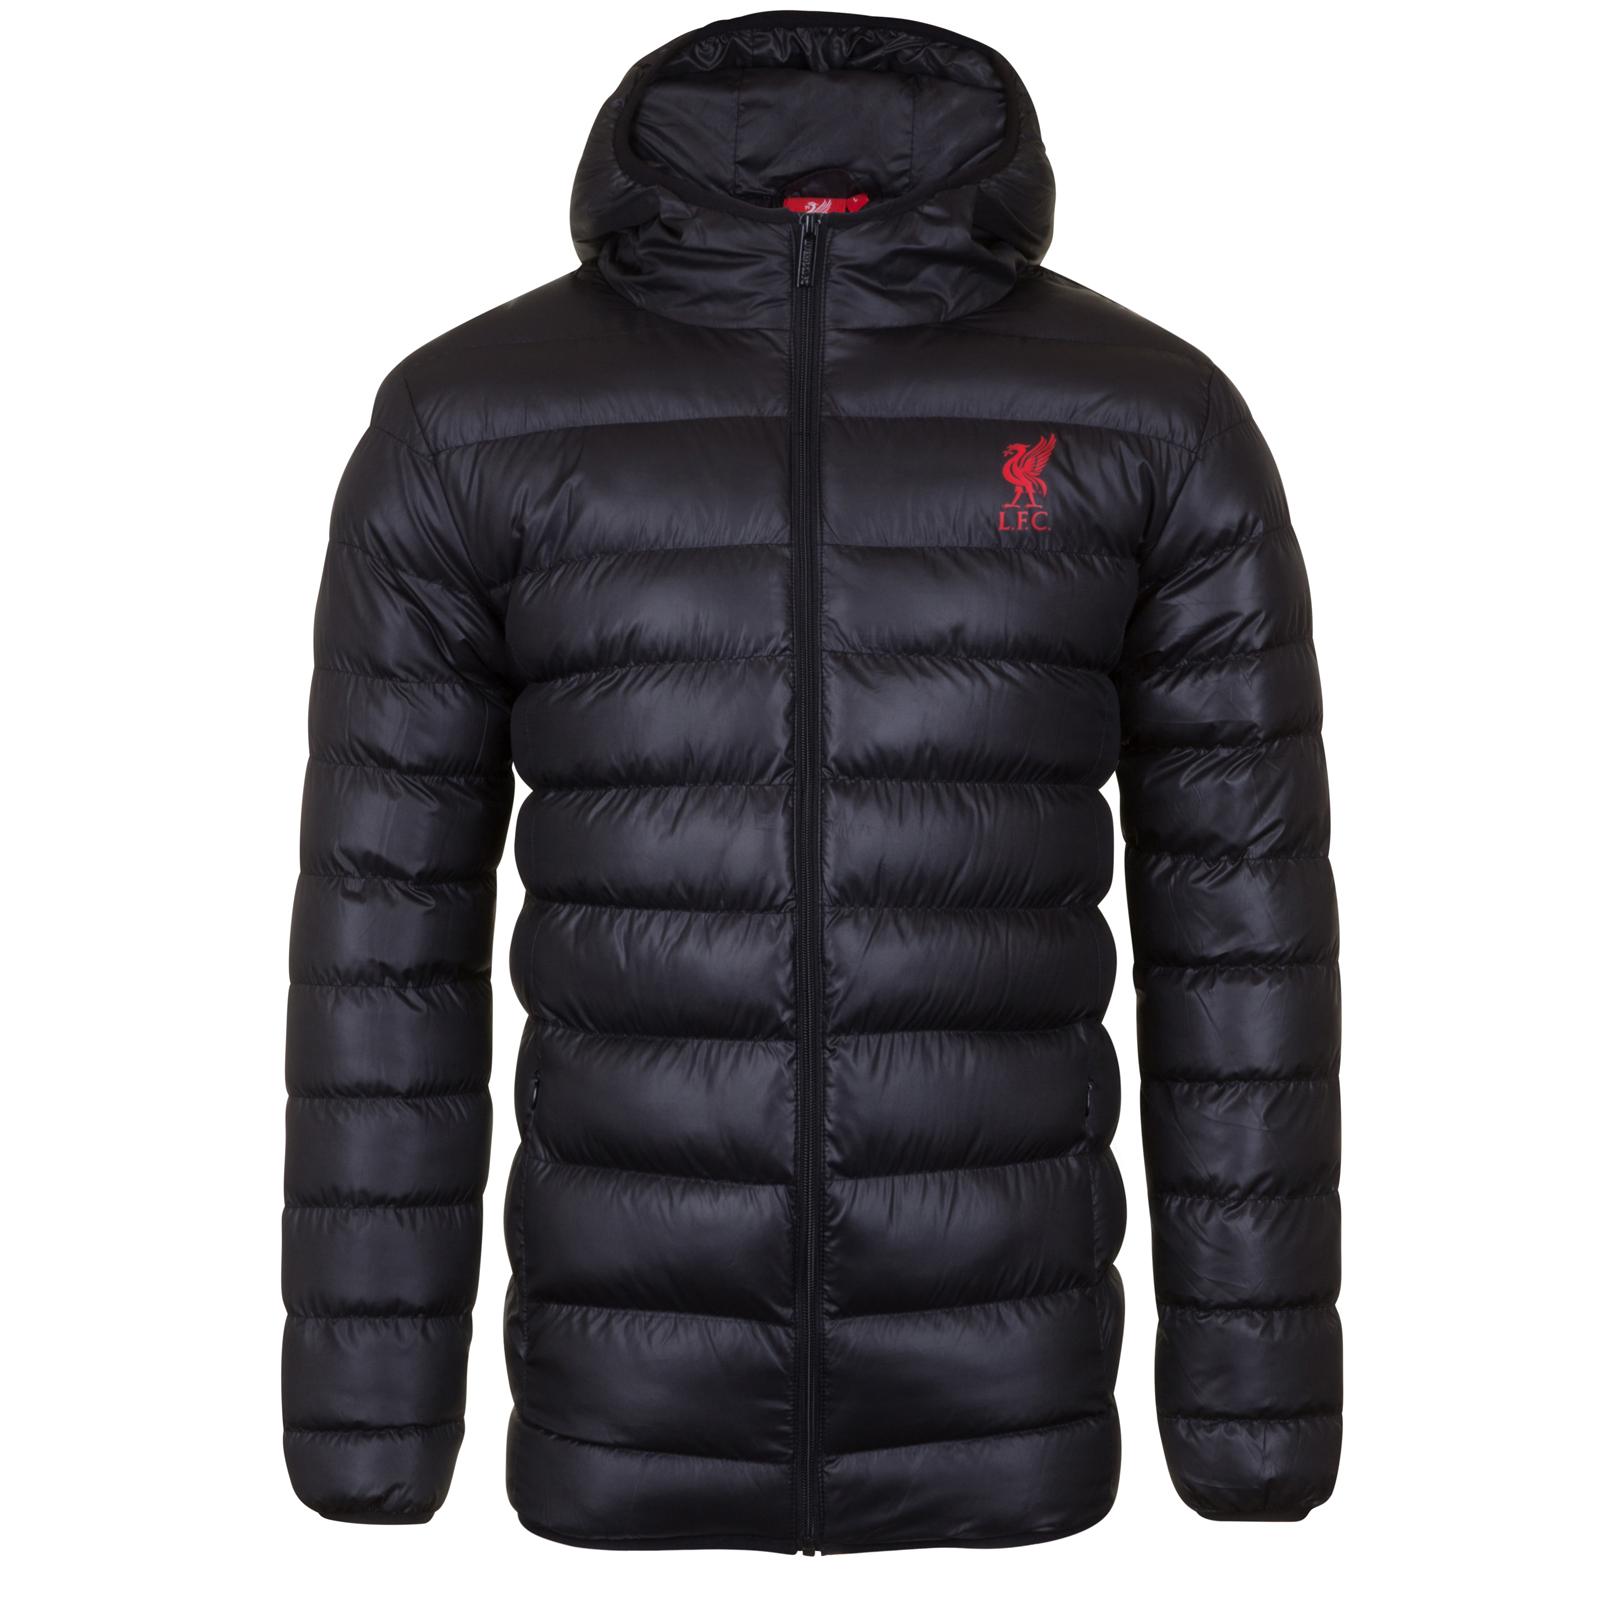 2be2cede213 liverpool fc fleece jacket on sale   OFF40% Discounts